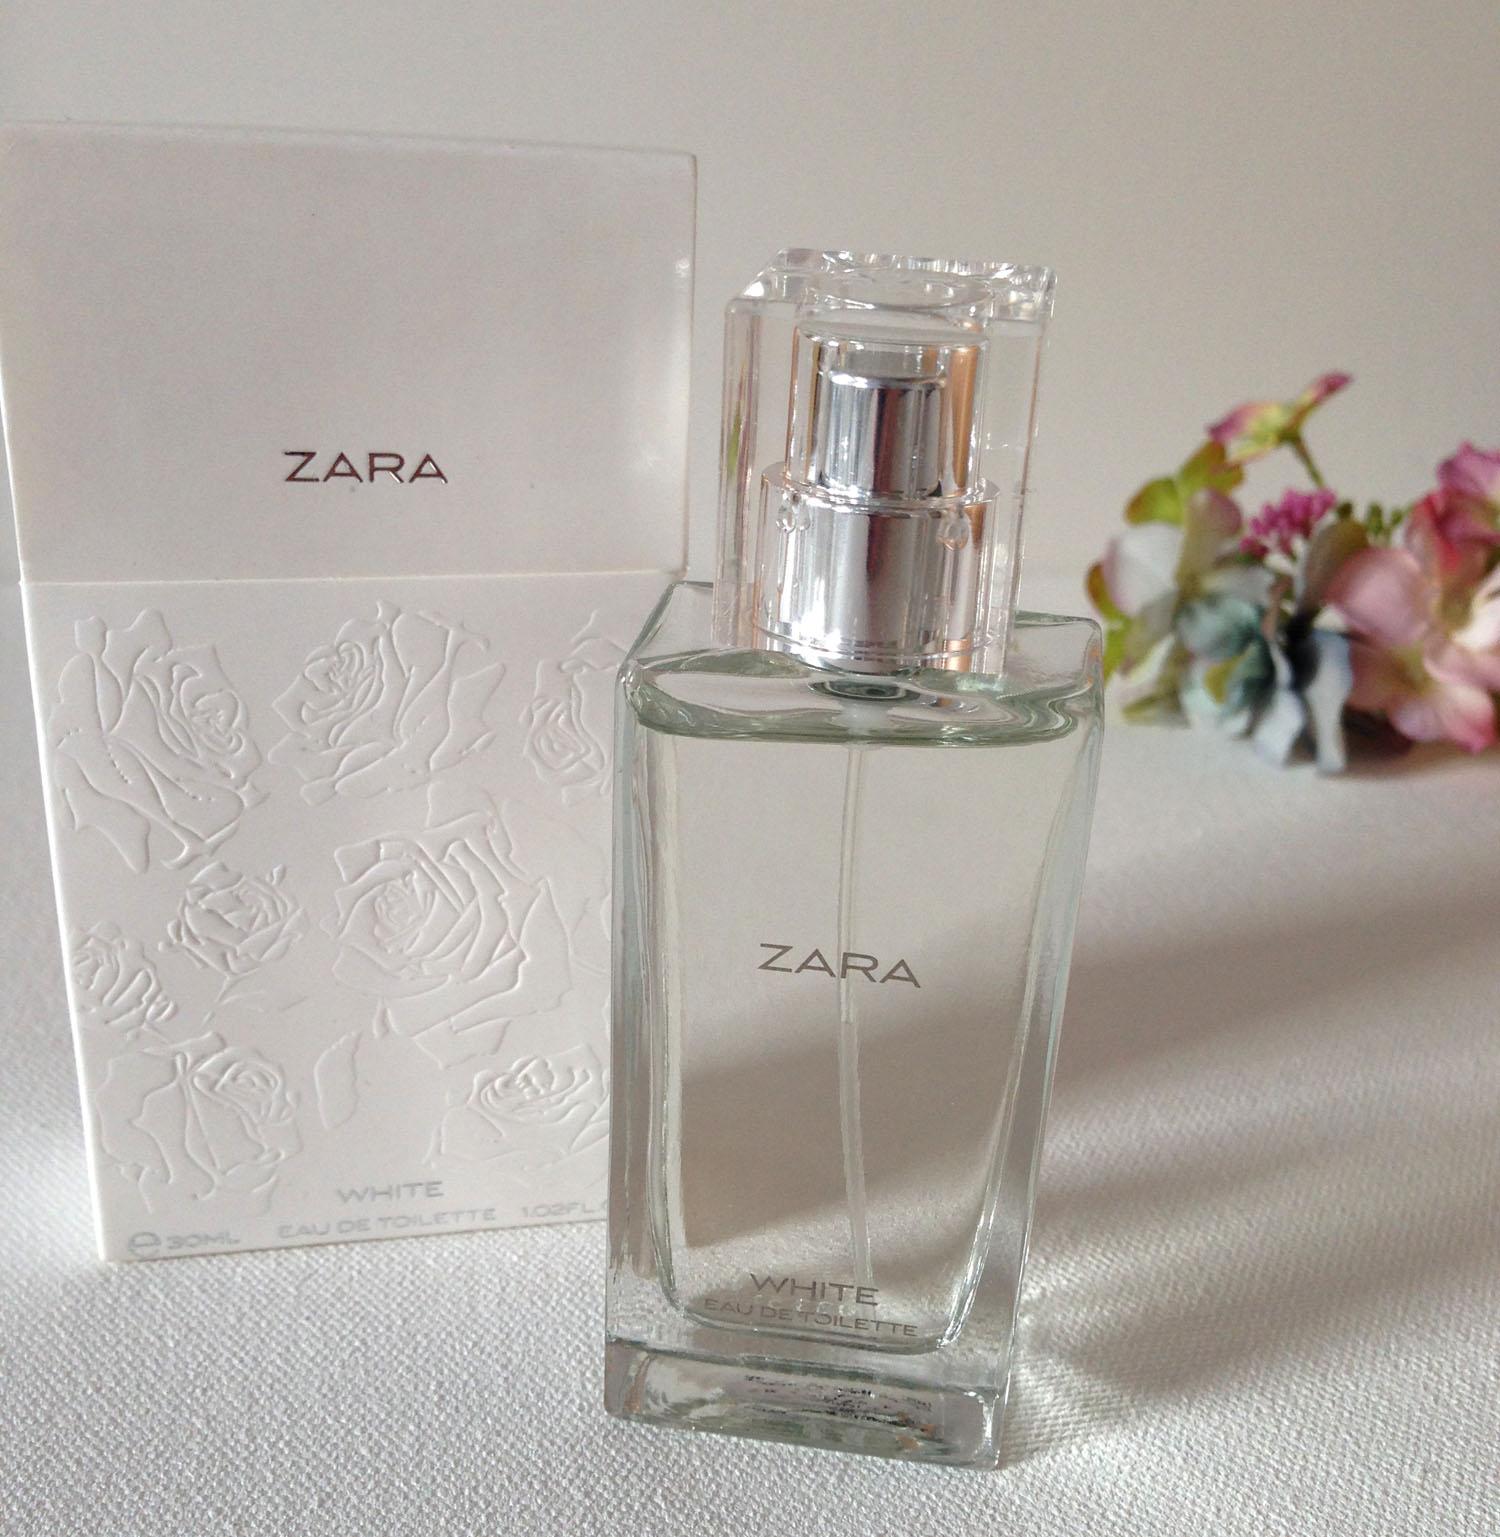 Summer Perfume Shopping Zara White Edt English Rose From